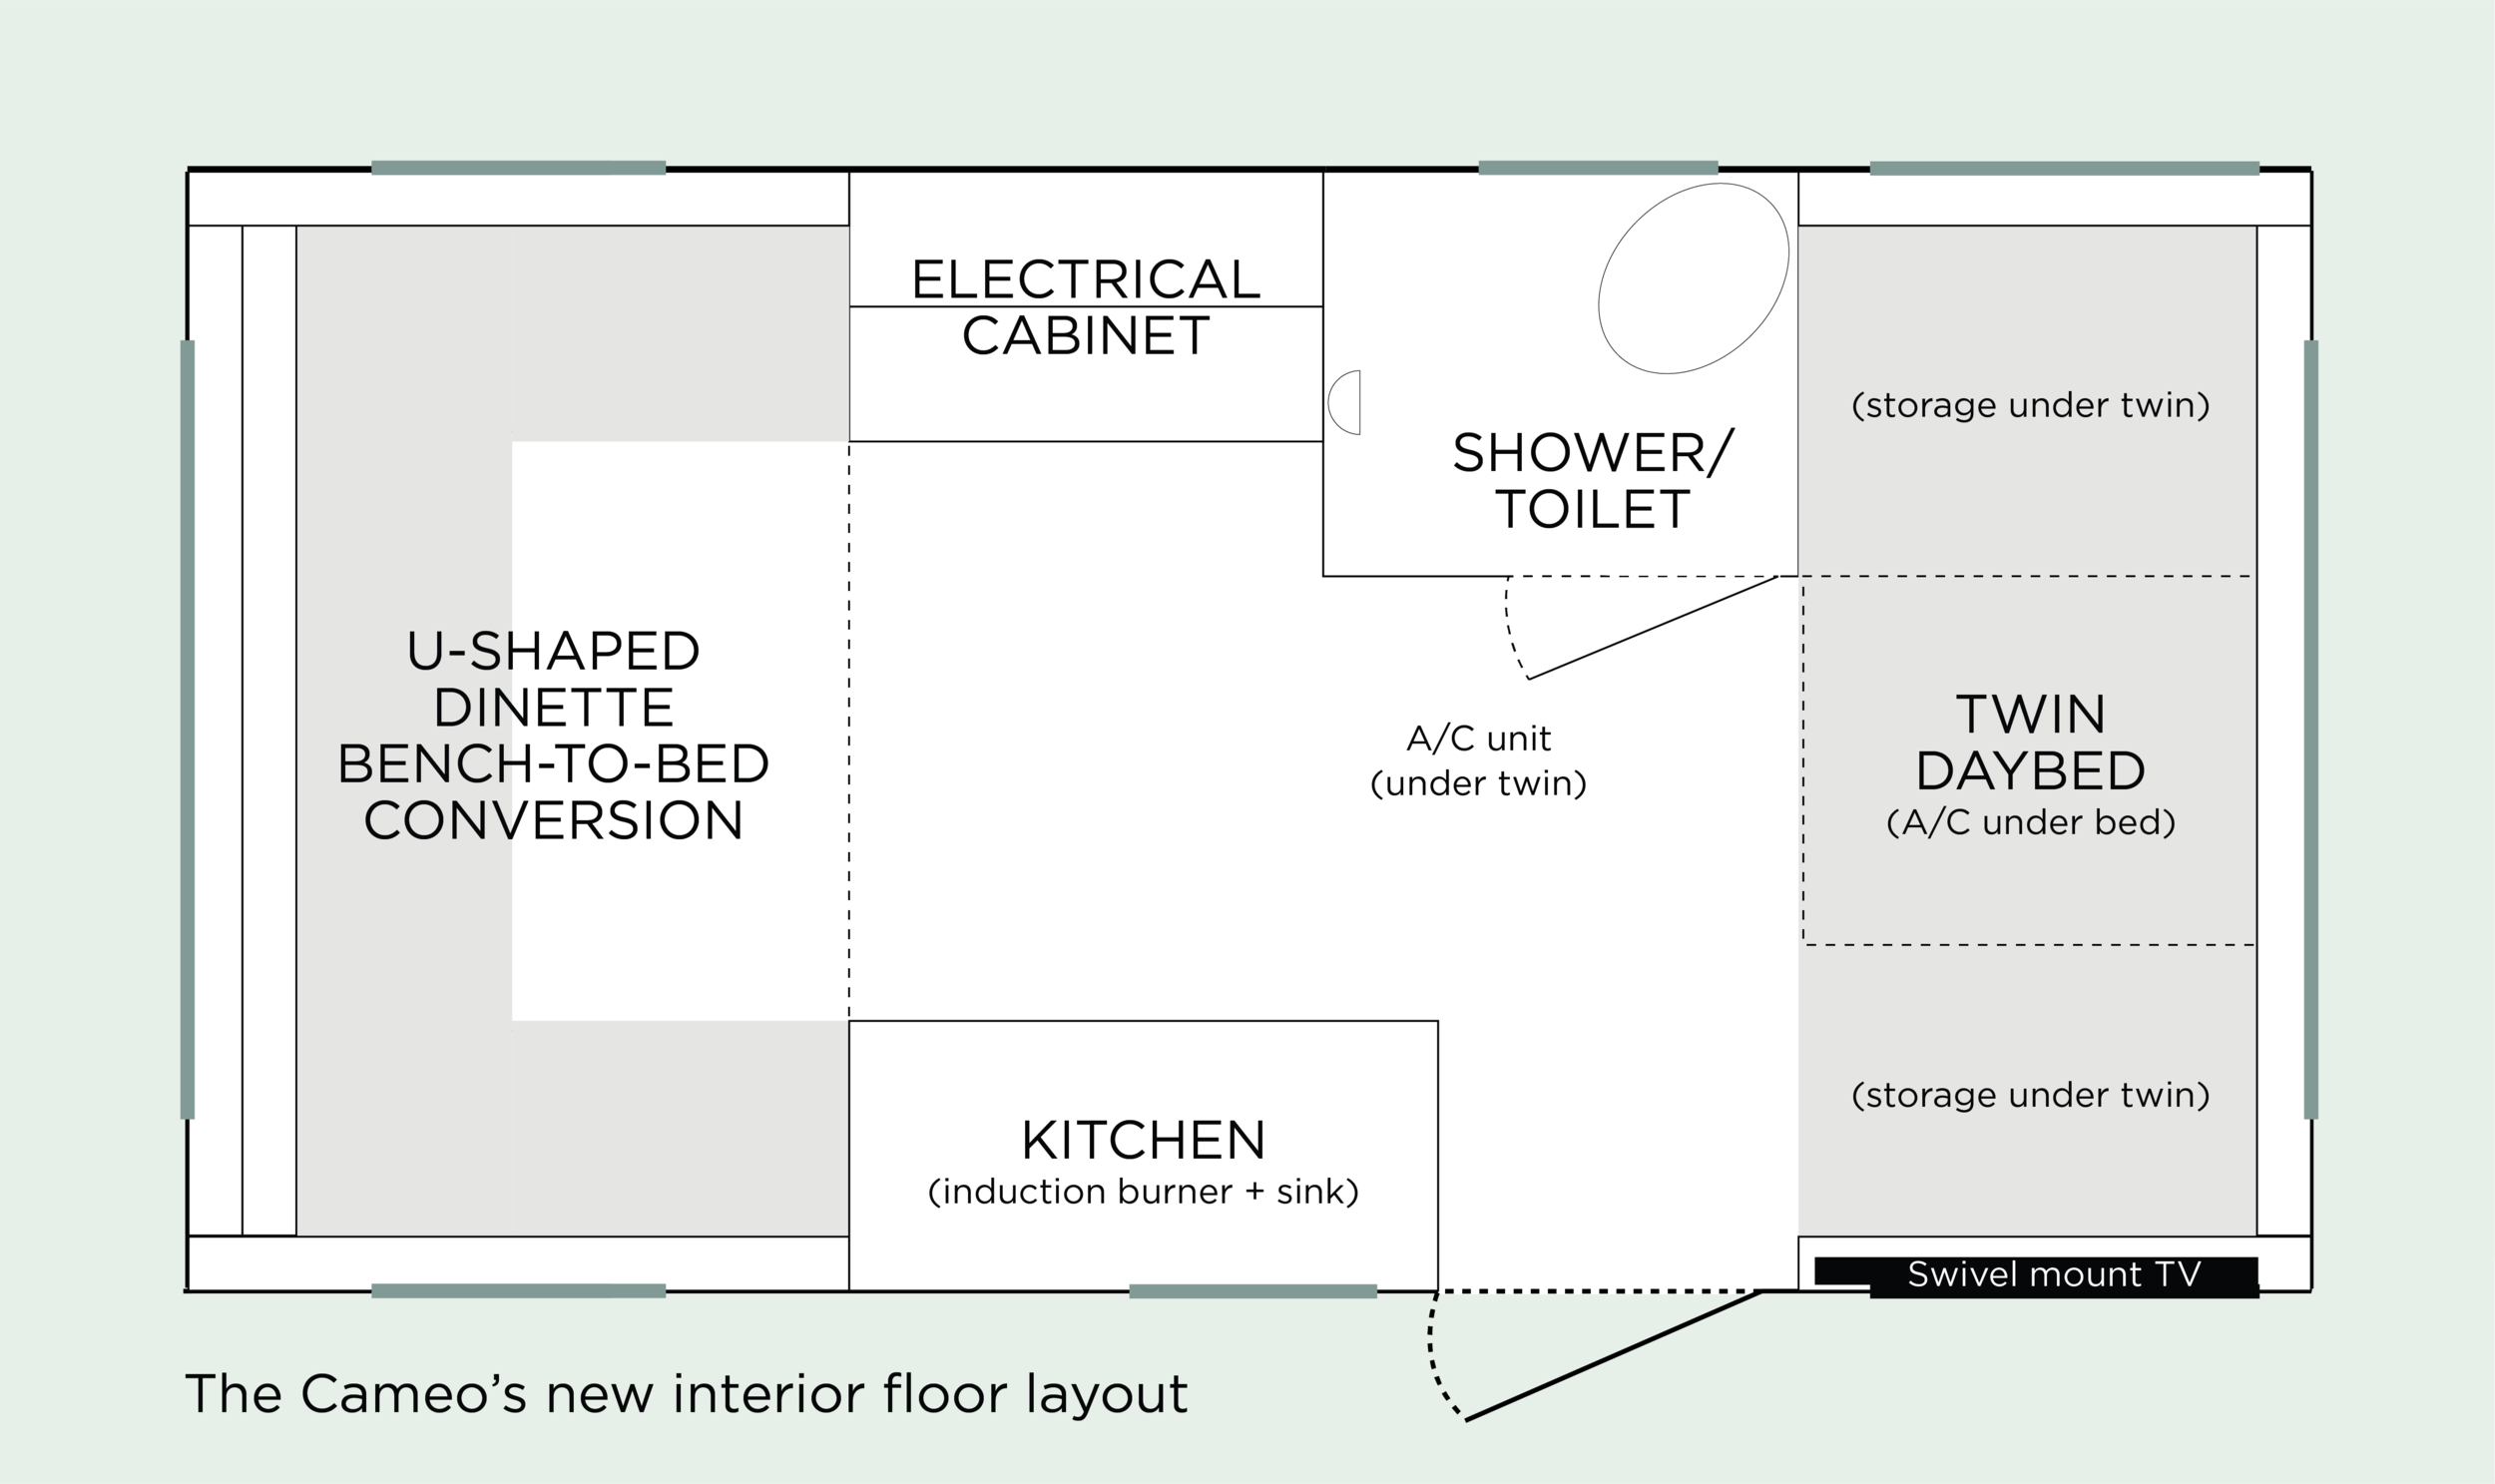 loneoakdesignco-cameo-floor-plan-new.png